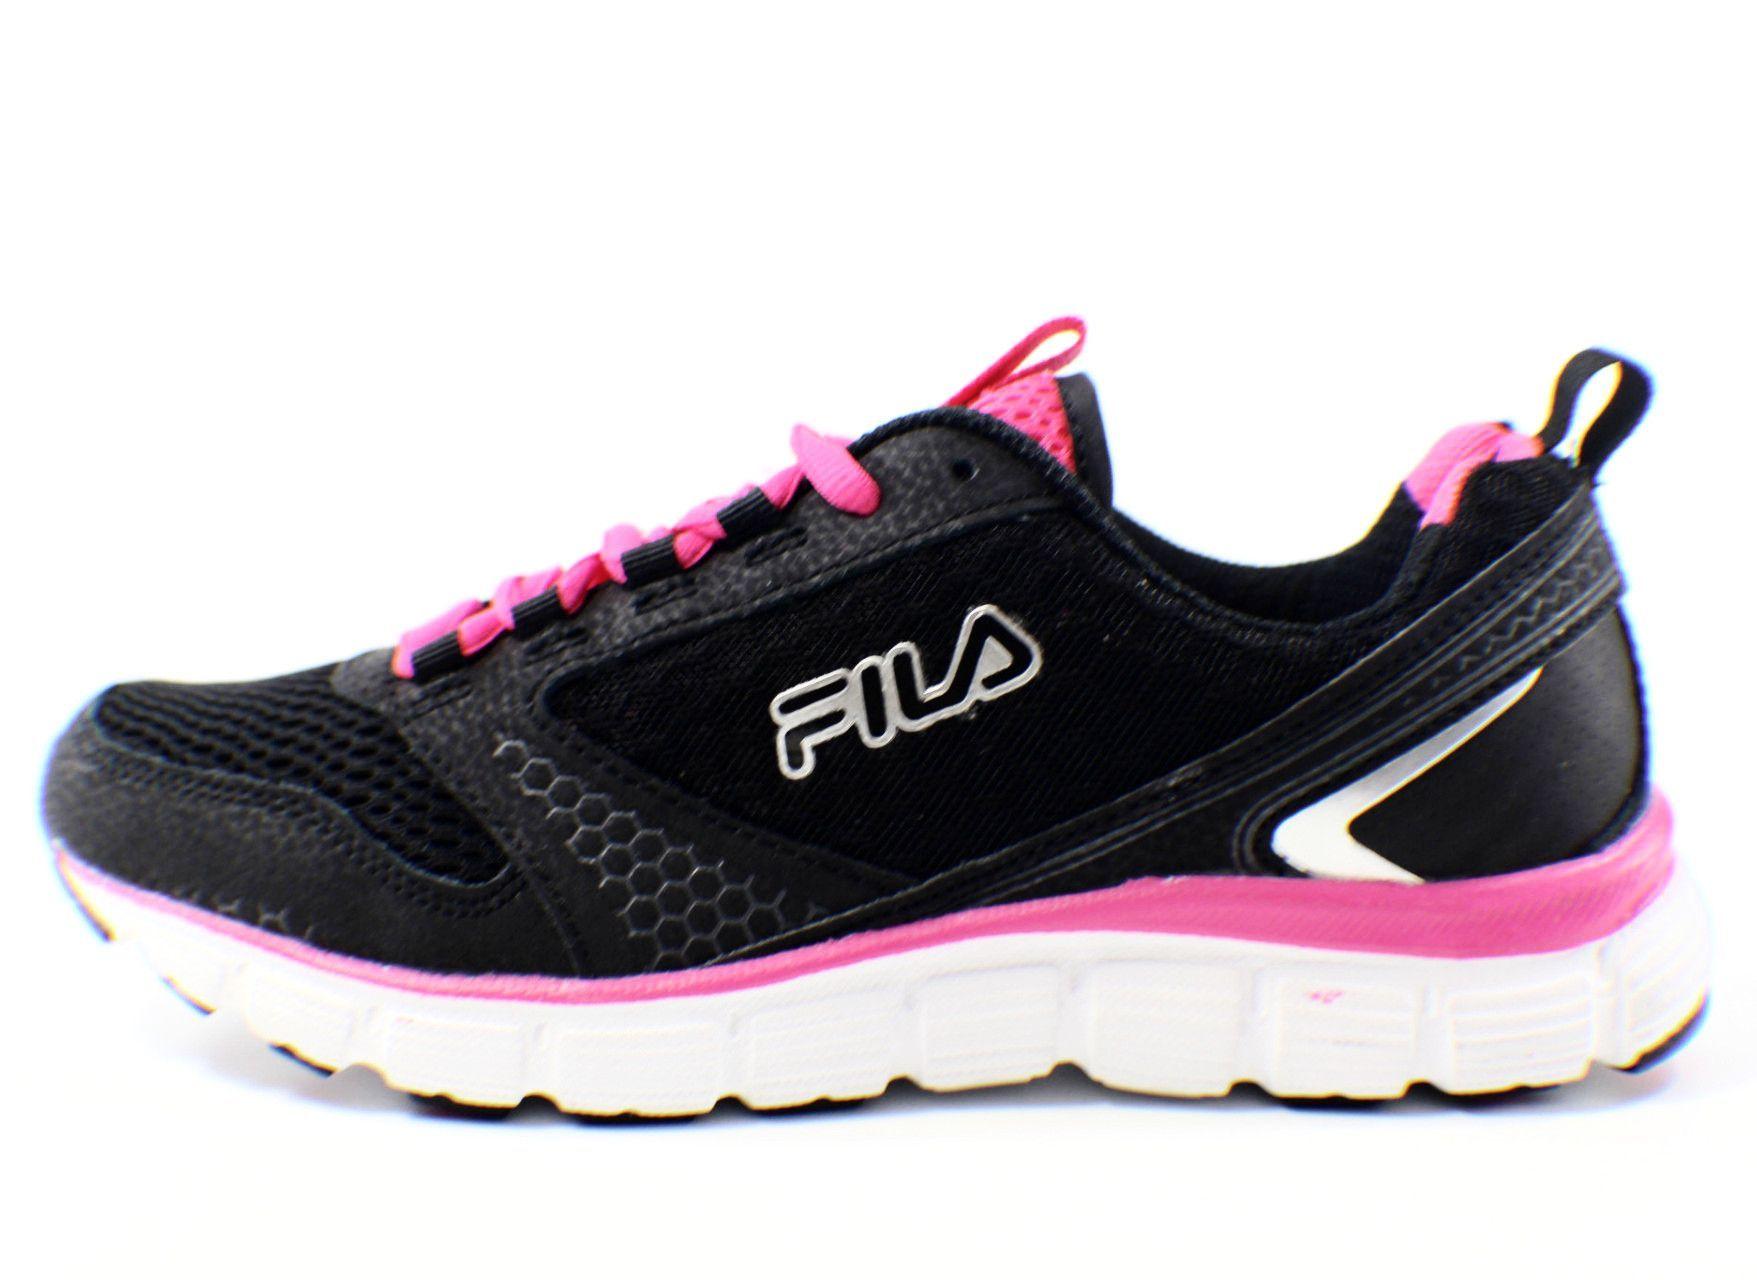 d0e4062db50a Fila Womens Memory Windstar Shoe Size 7.5